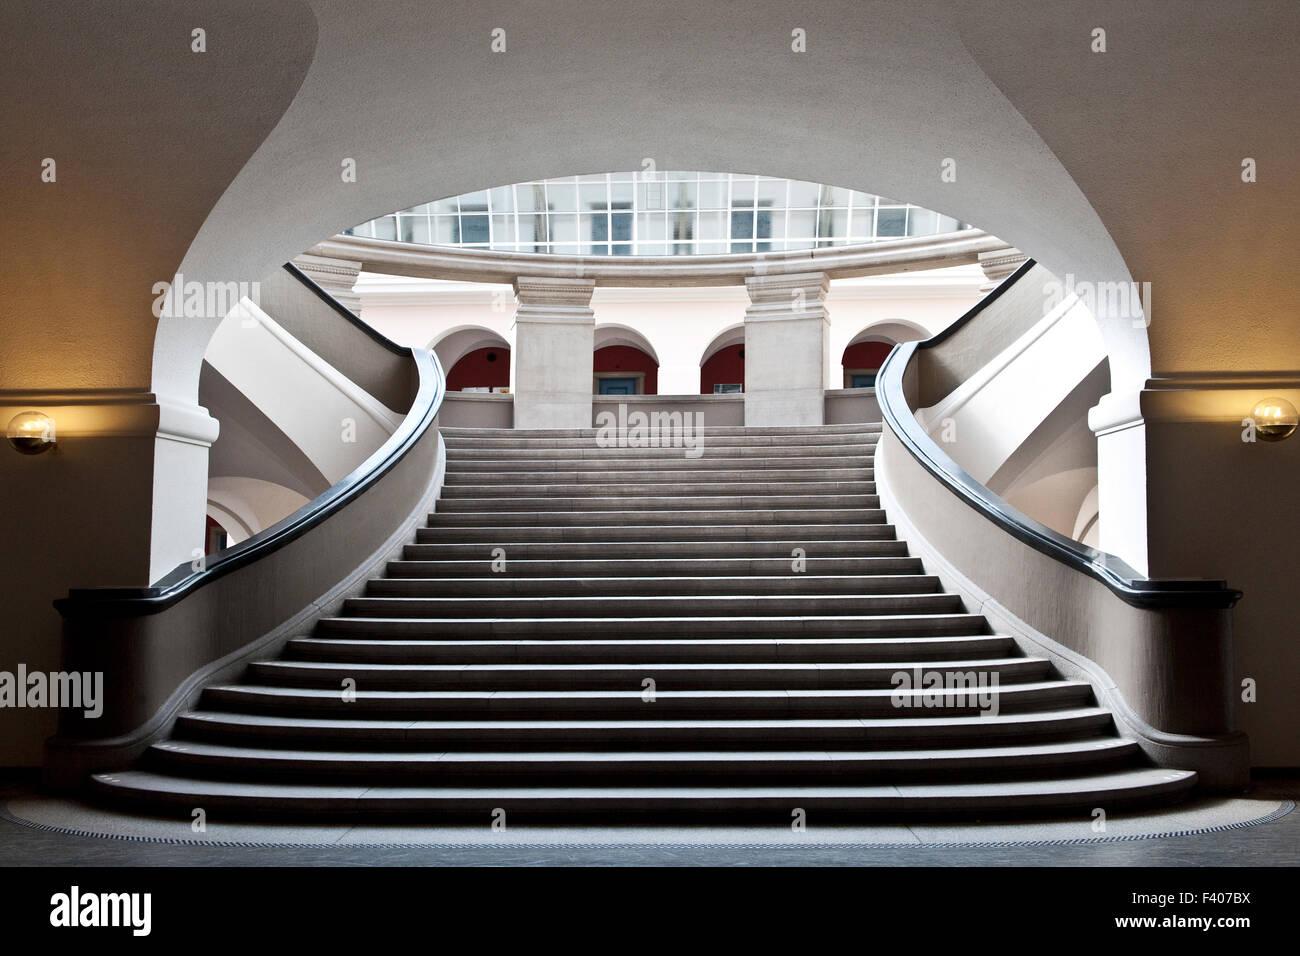 UNI Zurigo Immagini Stock